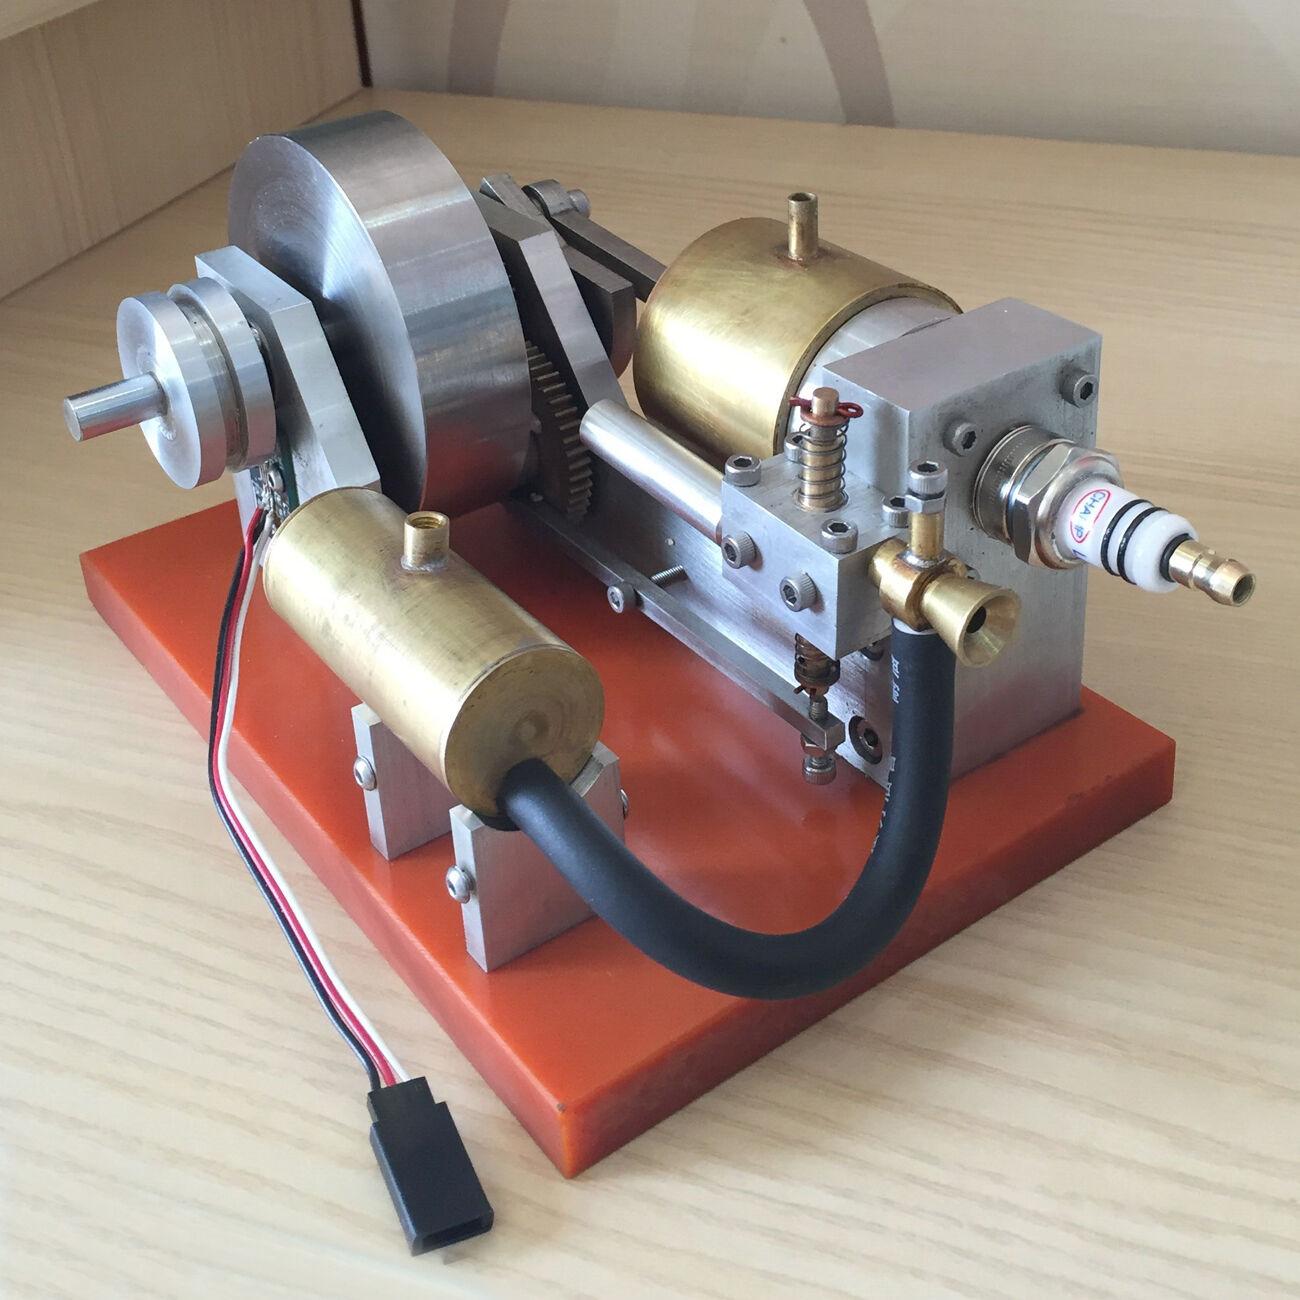 Horizontal Gasoline Engine Model Toy Petrol Fuel Micro Generator Motor Engine